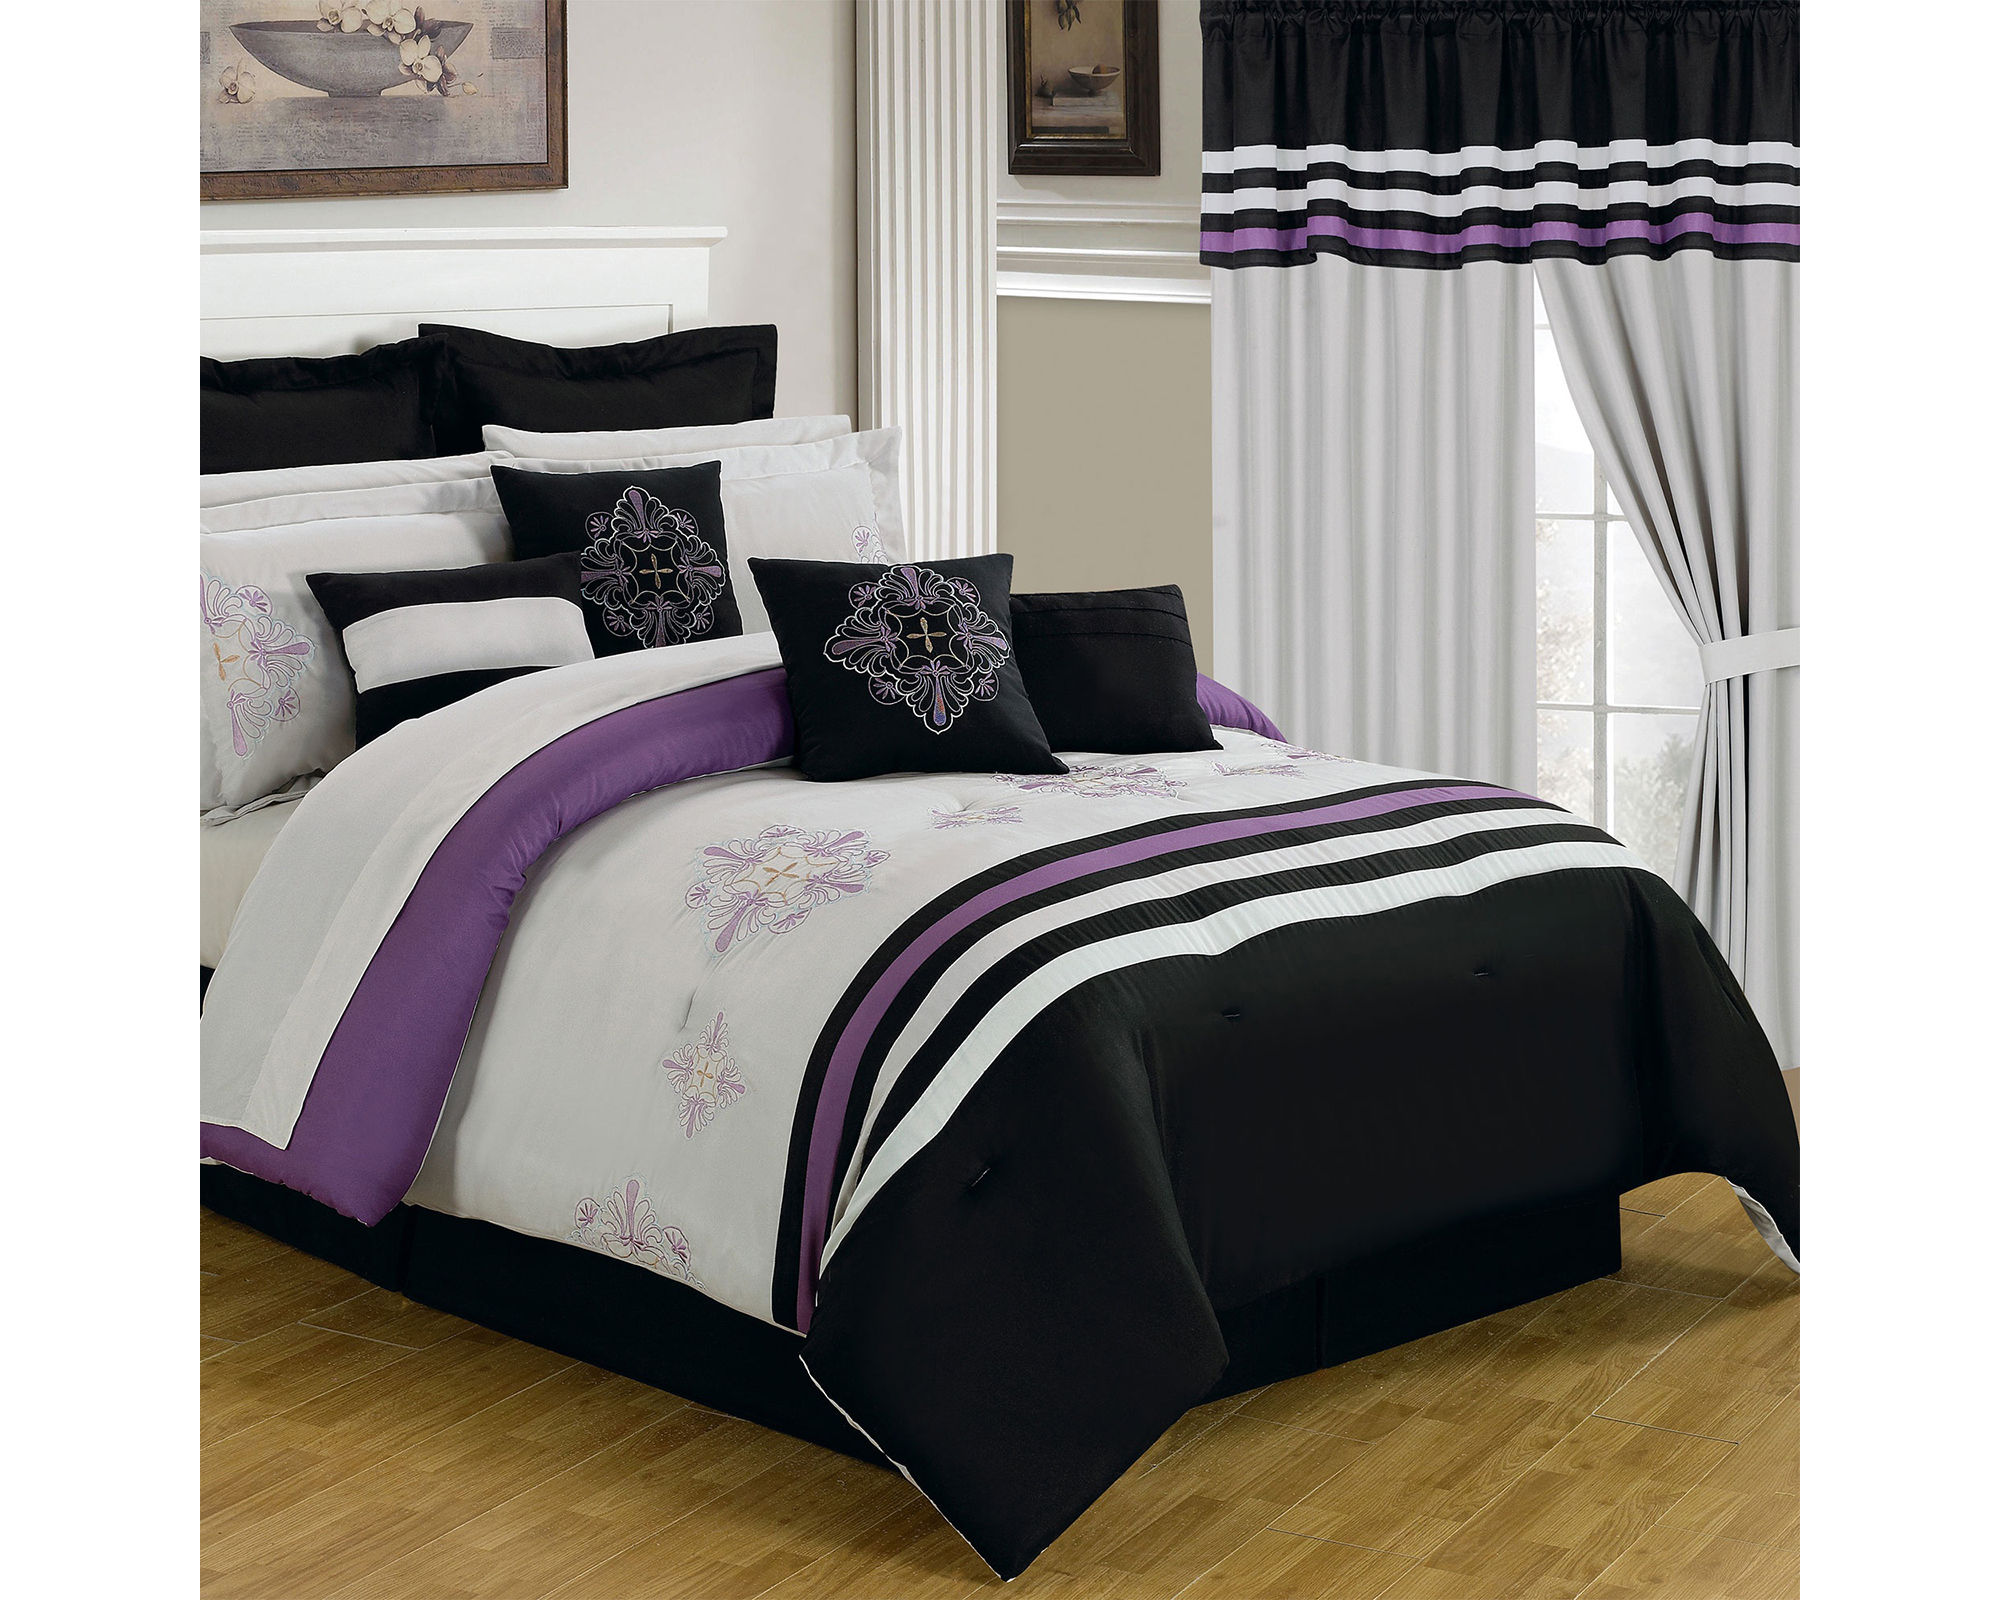 Cambridge Home Rachel Complete Bedding Set with Sheets